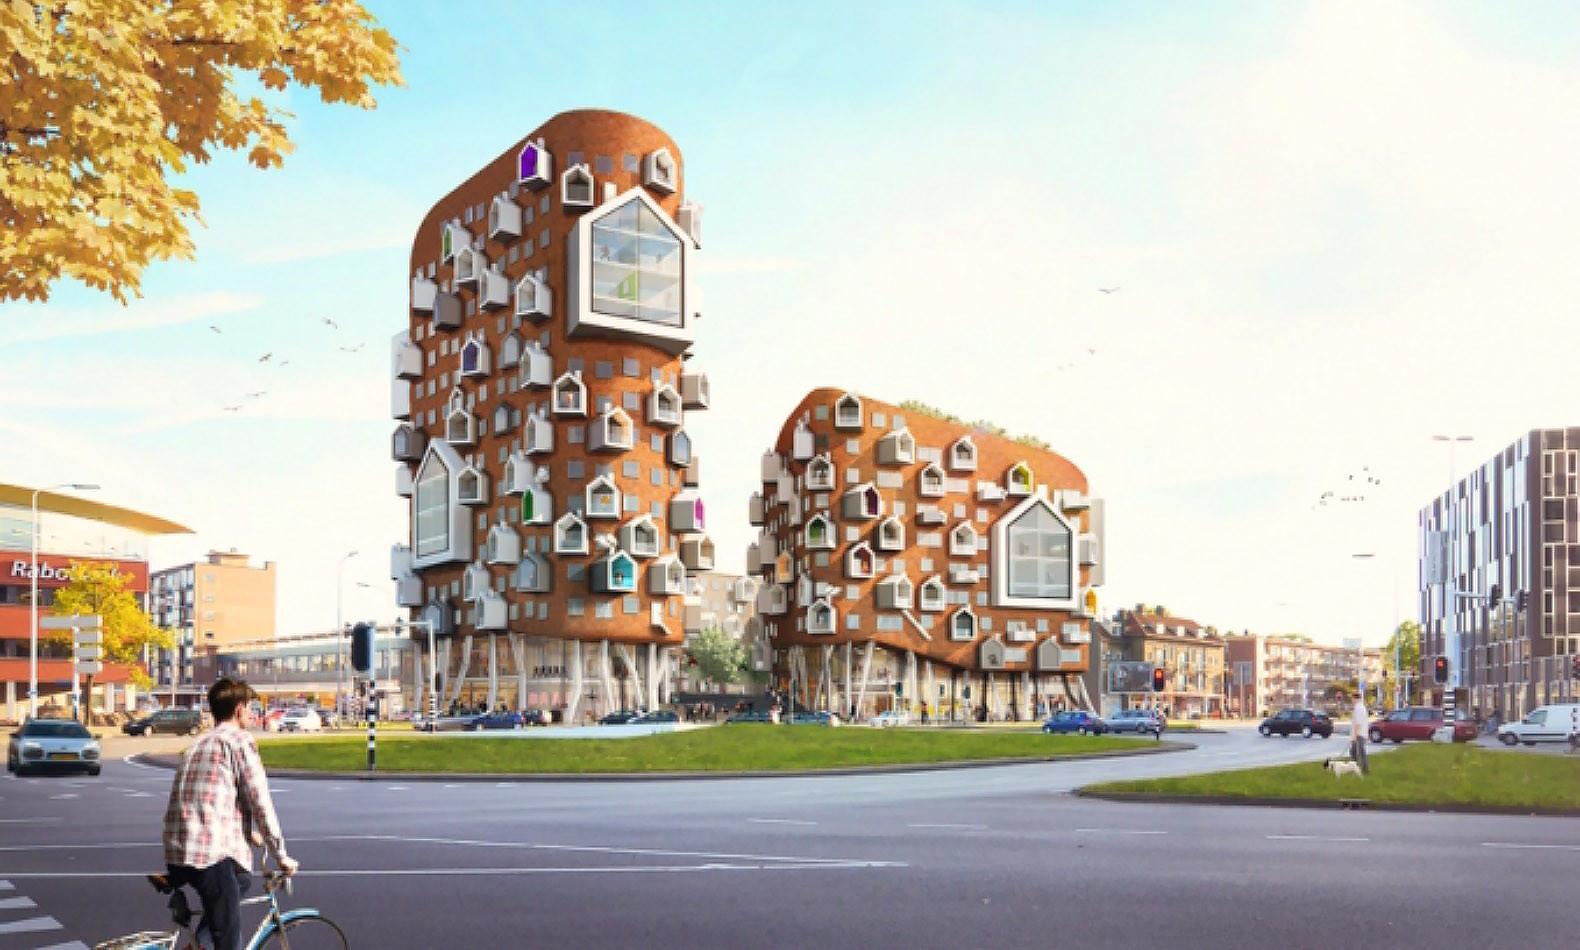 Best Buildings To See In Amsterdam